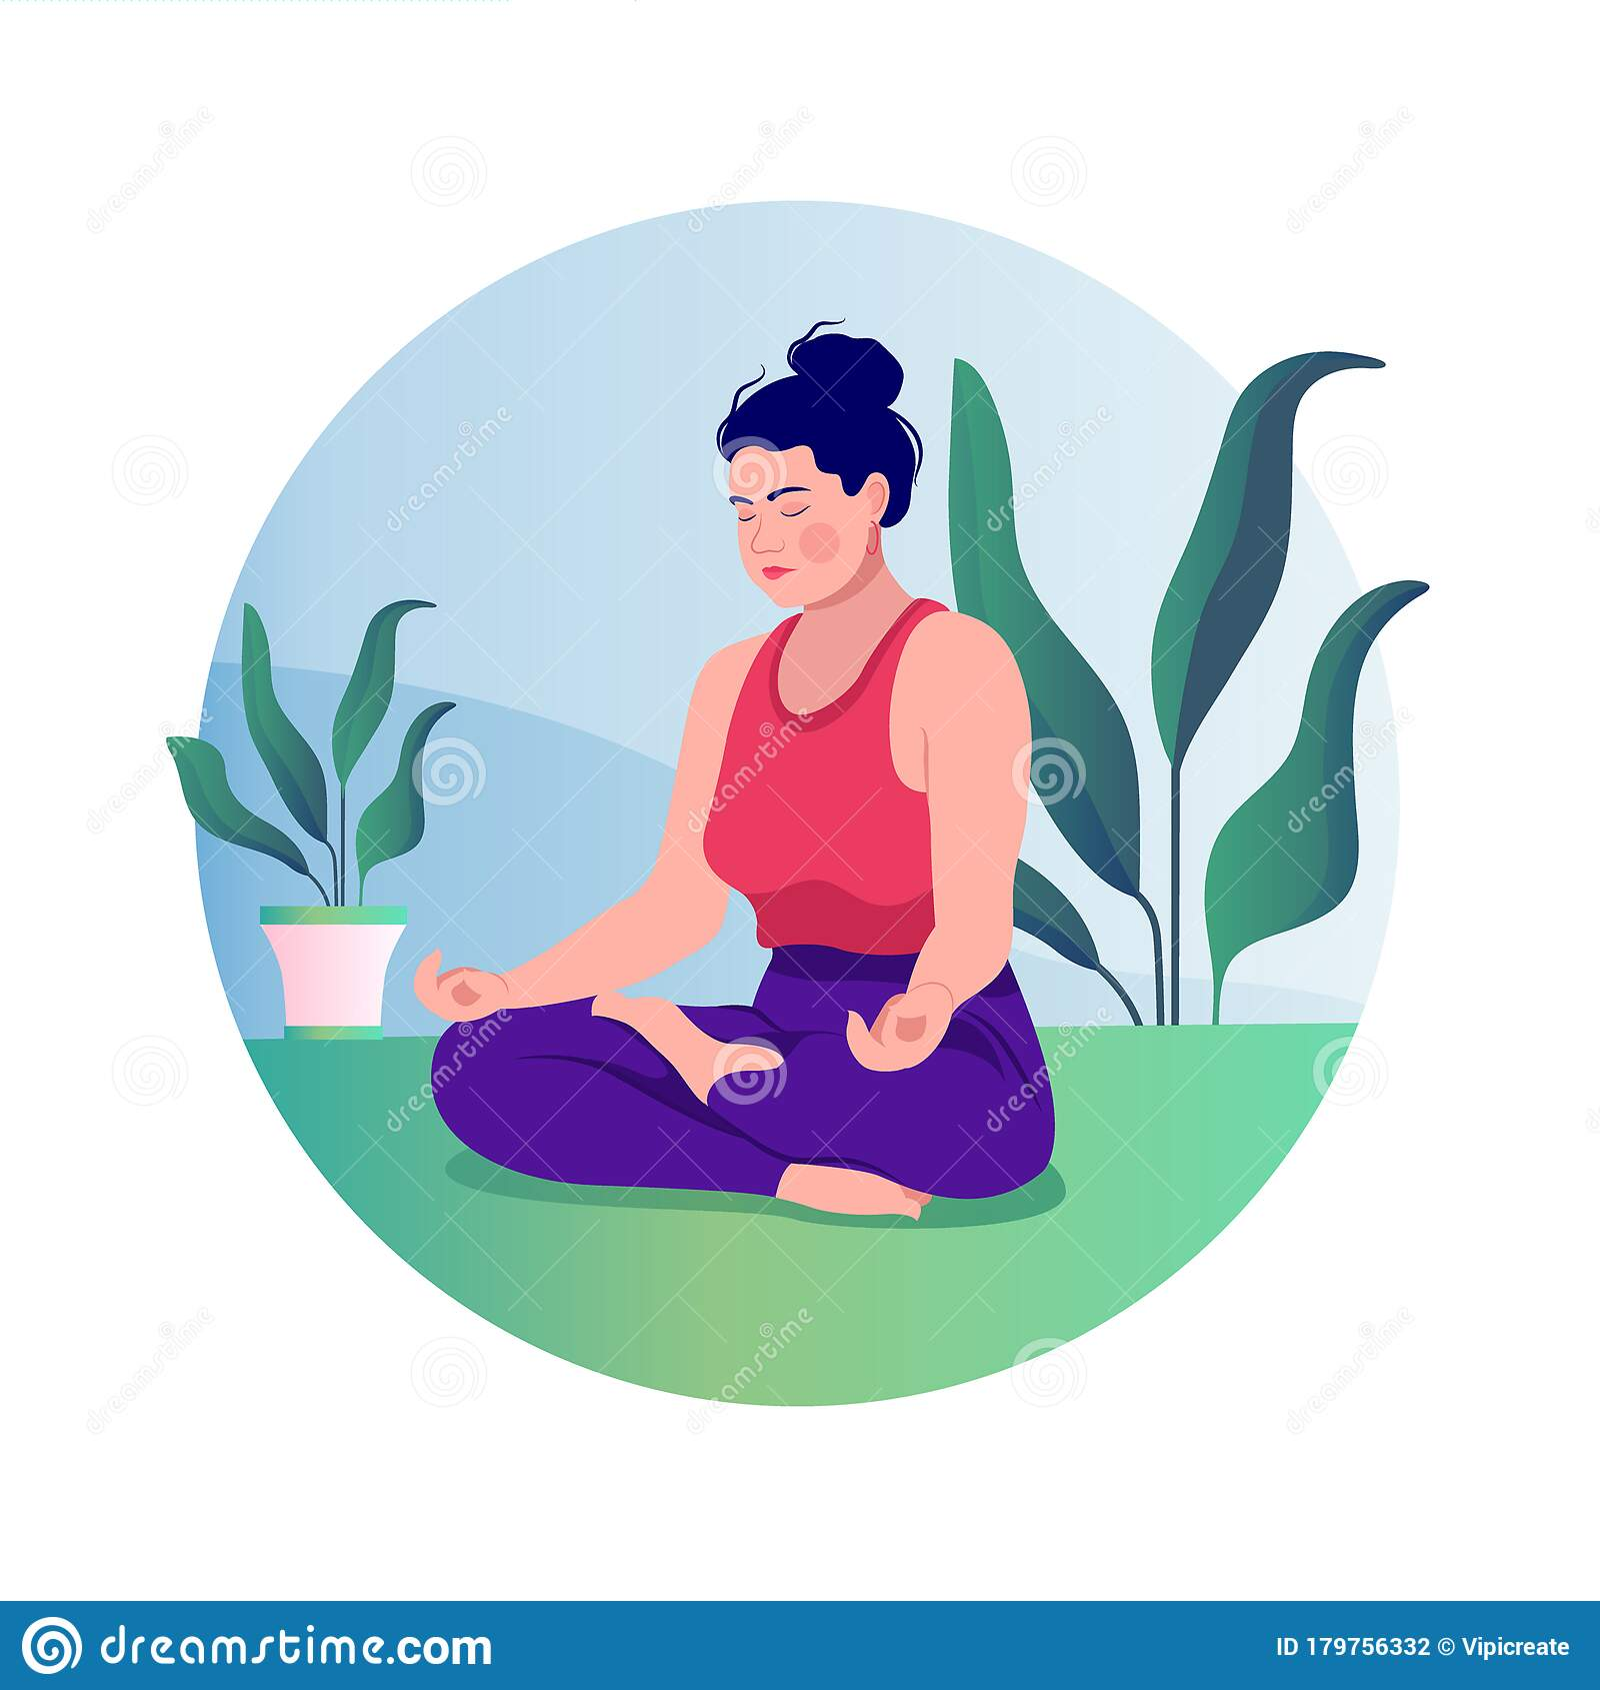 Creative Poster Or Banner Design With Illustration Of Woman Yoga Lotus Pose Practicing Yoga Vector Illustration Young And Happy Stock Illustration Illustration Of Meditating Modern 179756332